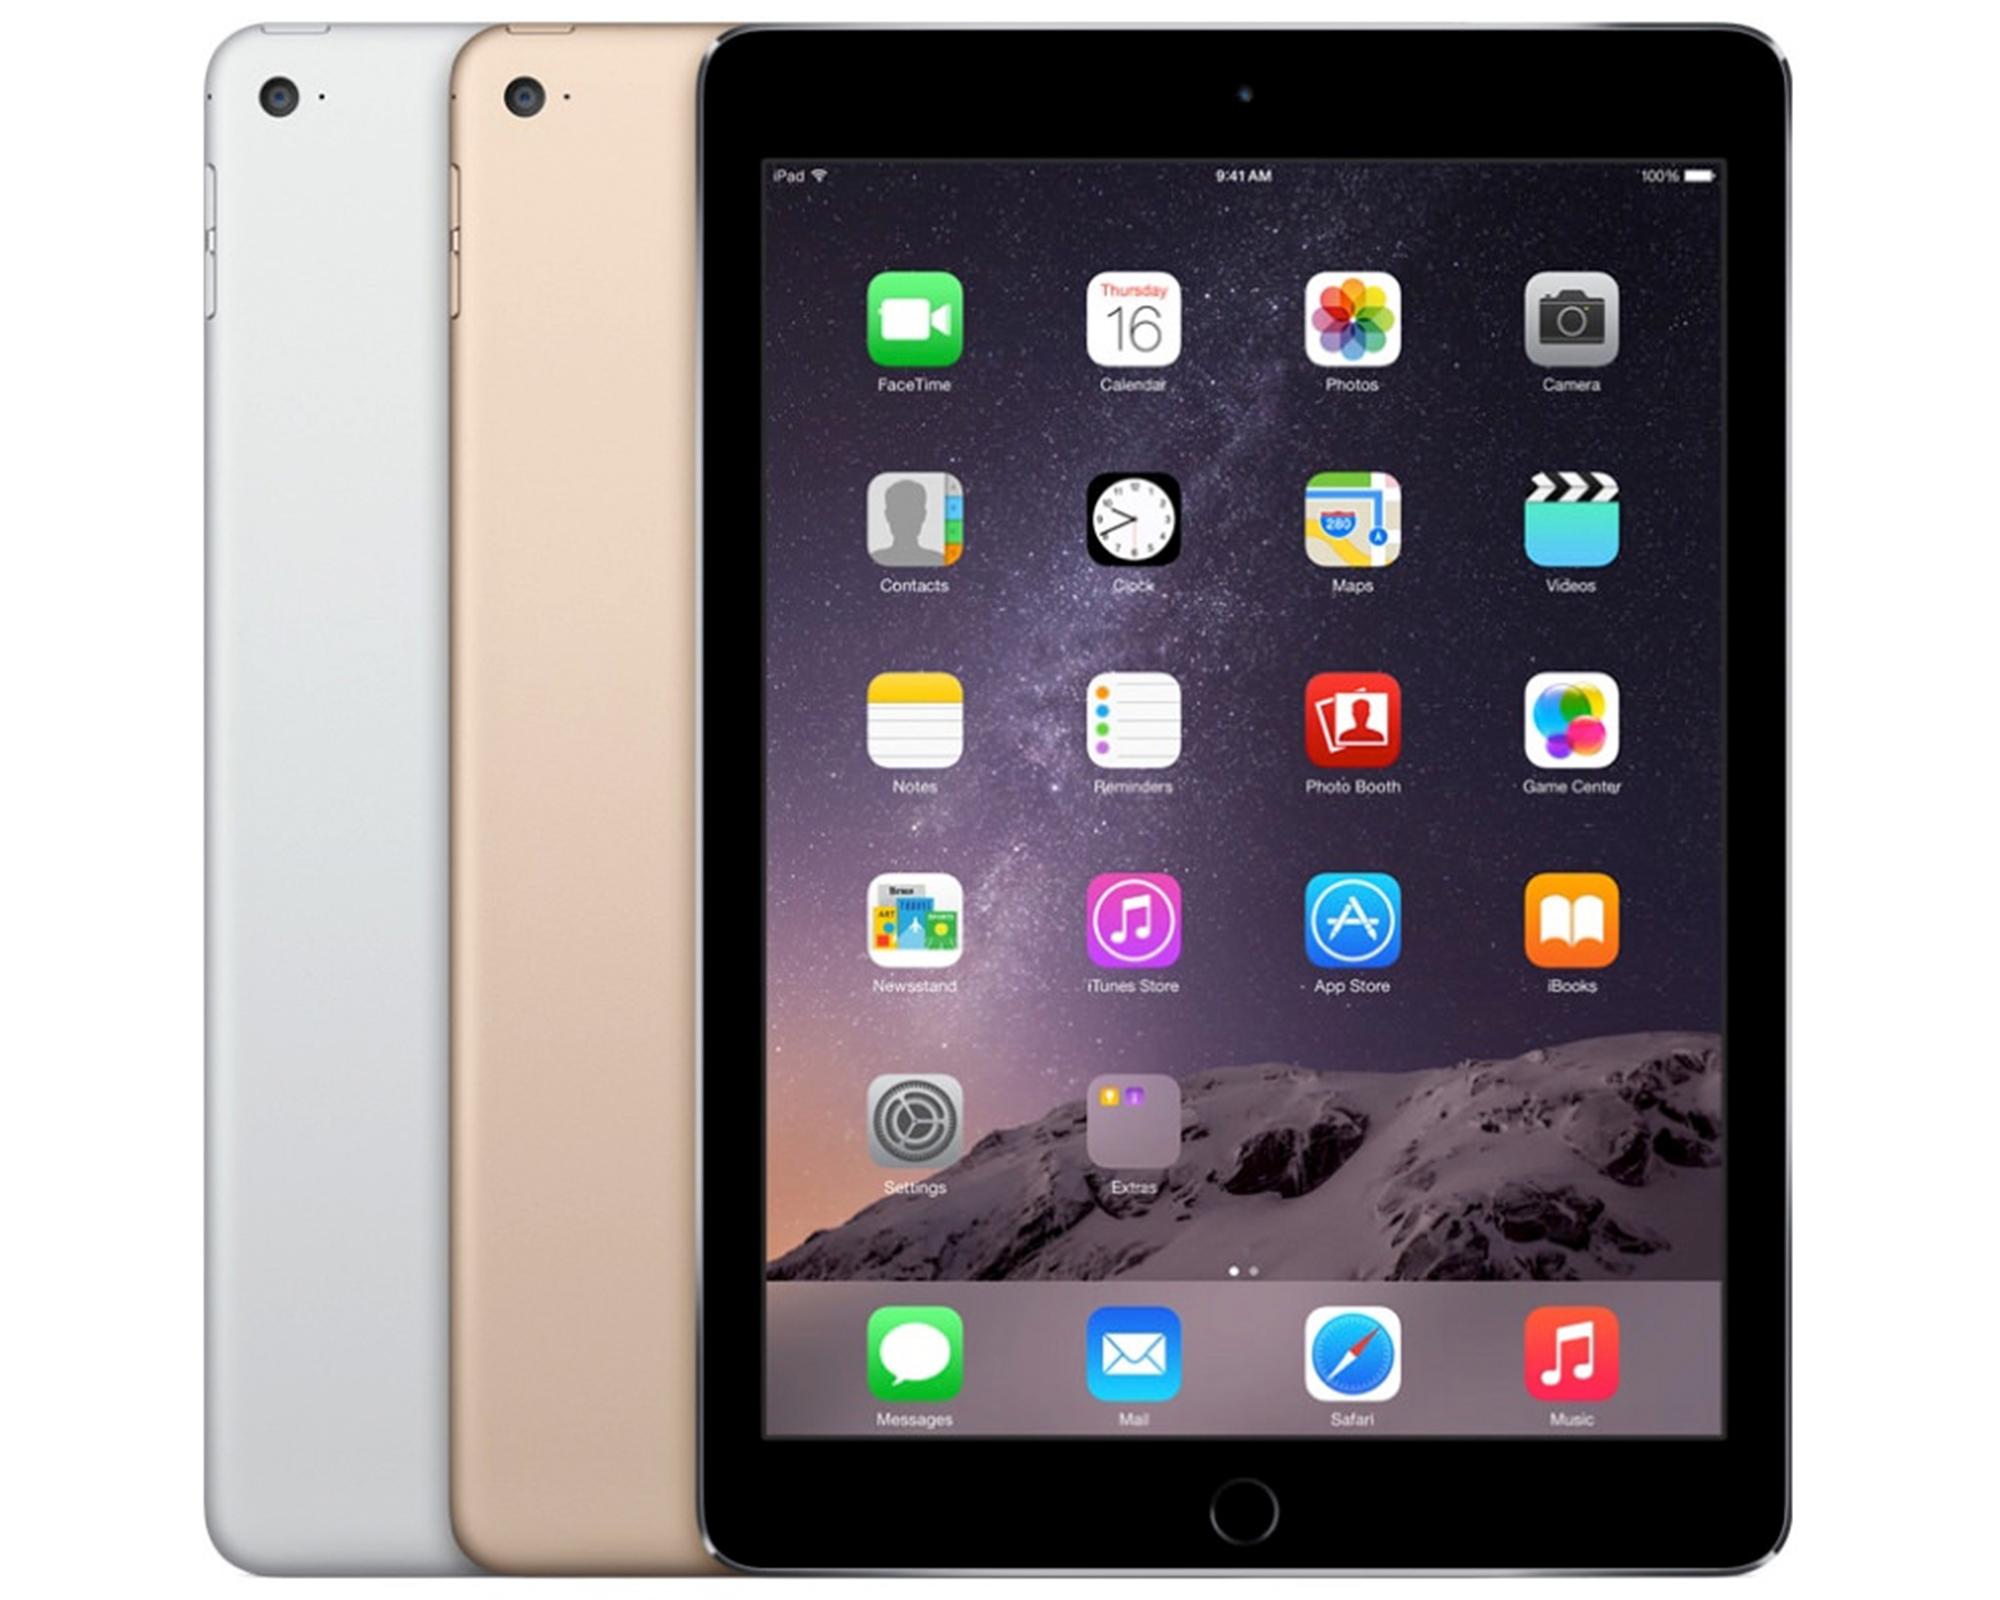 Apple iPad Air,mini,2,3,4 64GB 32GB 16GB Wi-Fi+4G Cellular (1 Year Warranty)